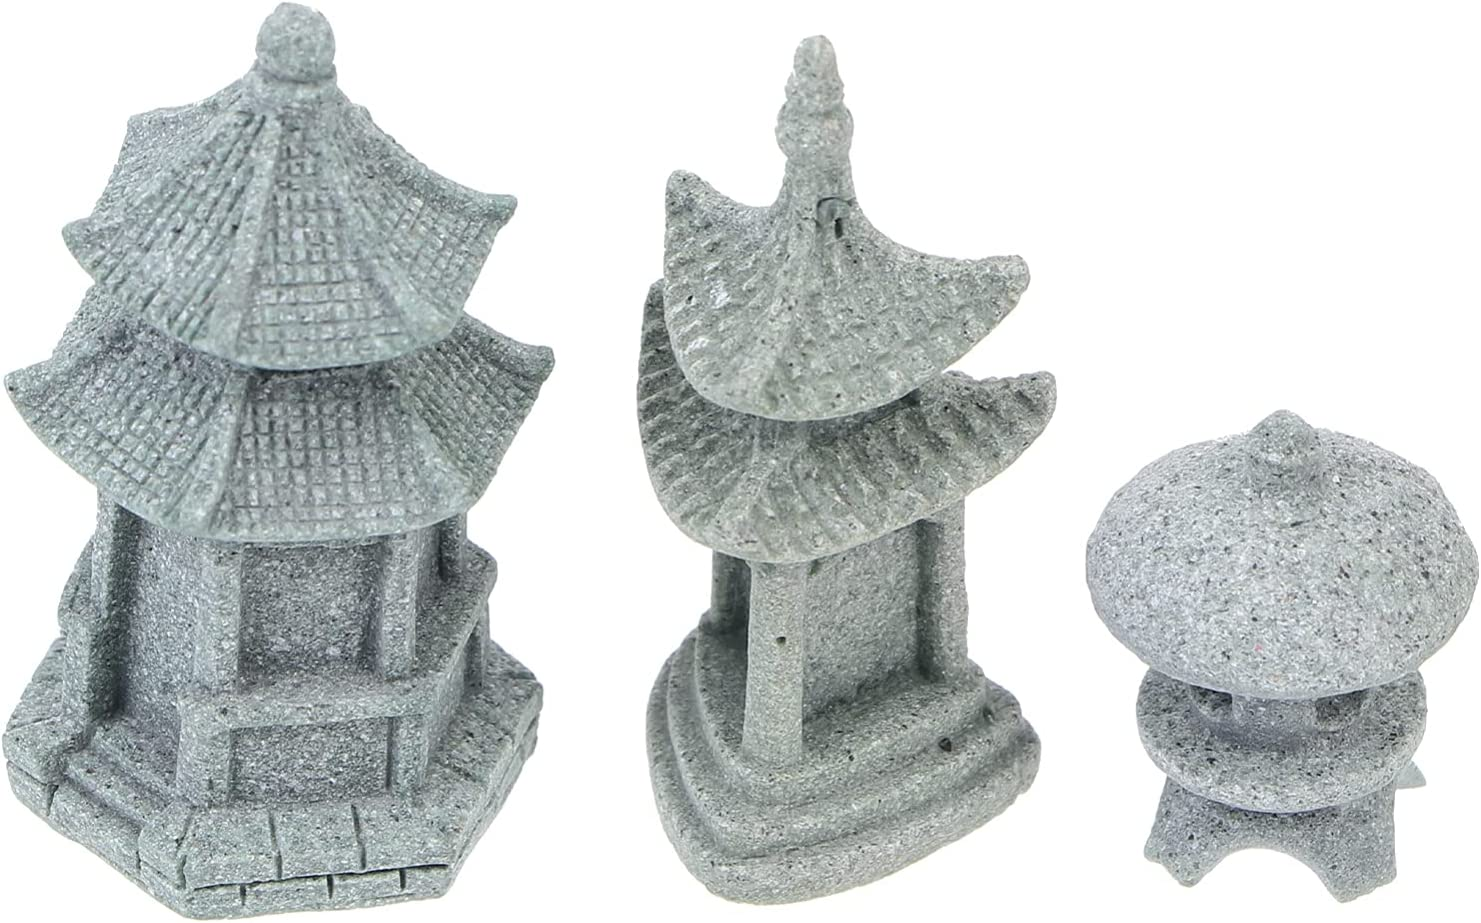 Happyyami 3Pcs Mini Pagoda Statue Japanese Style Pagoda Lantern Mini Fairy Decor for Garden Patio Micro Landscape Yard Bonsai Decoration